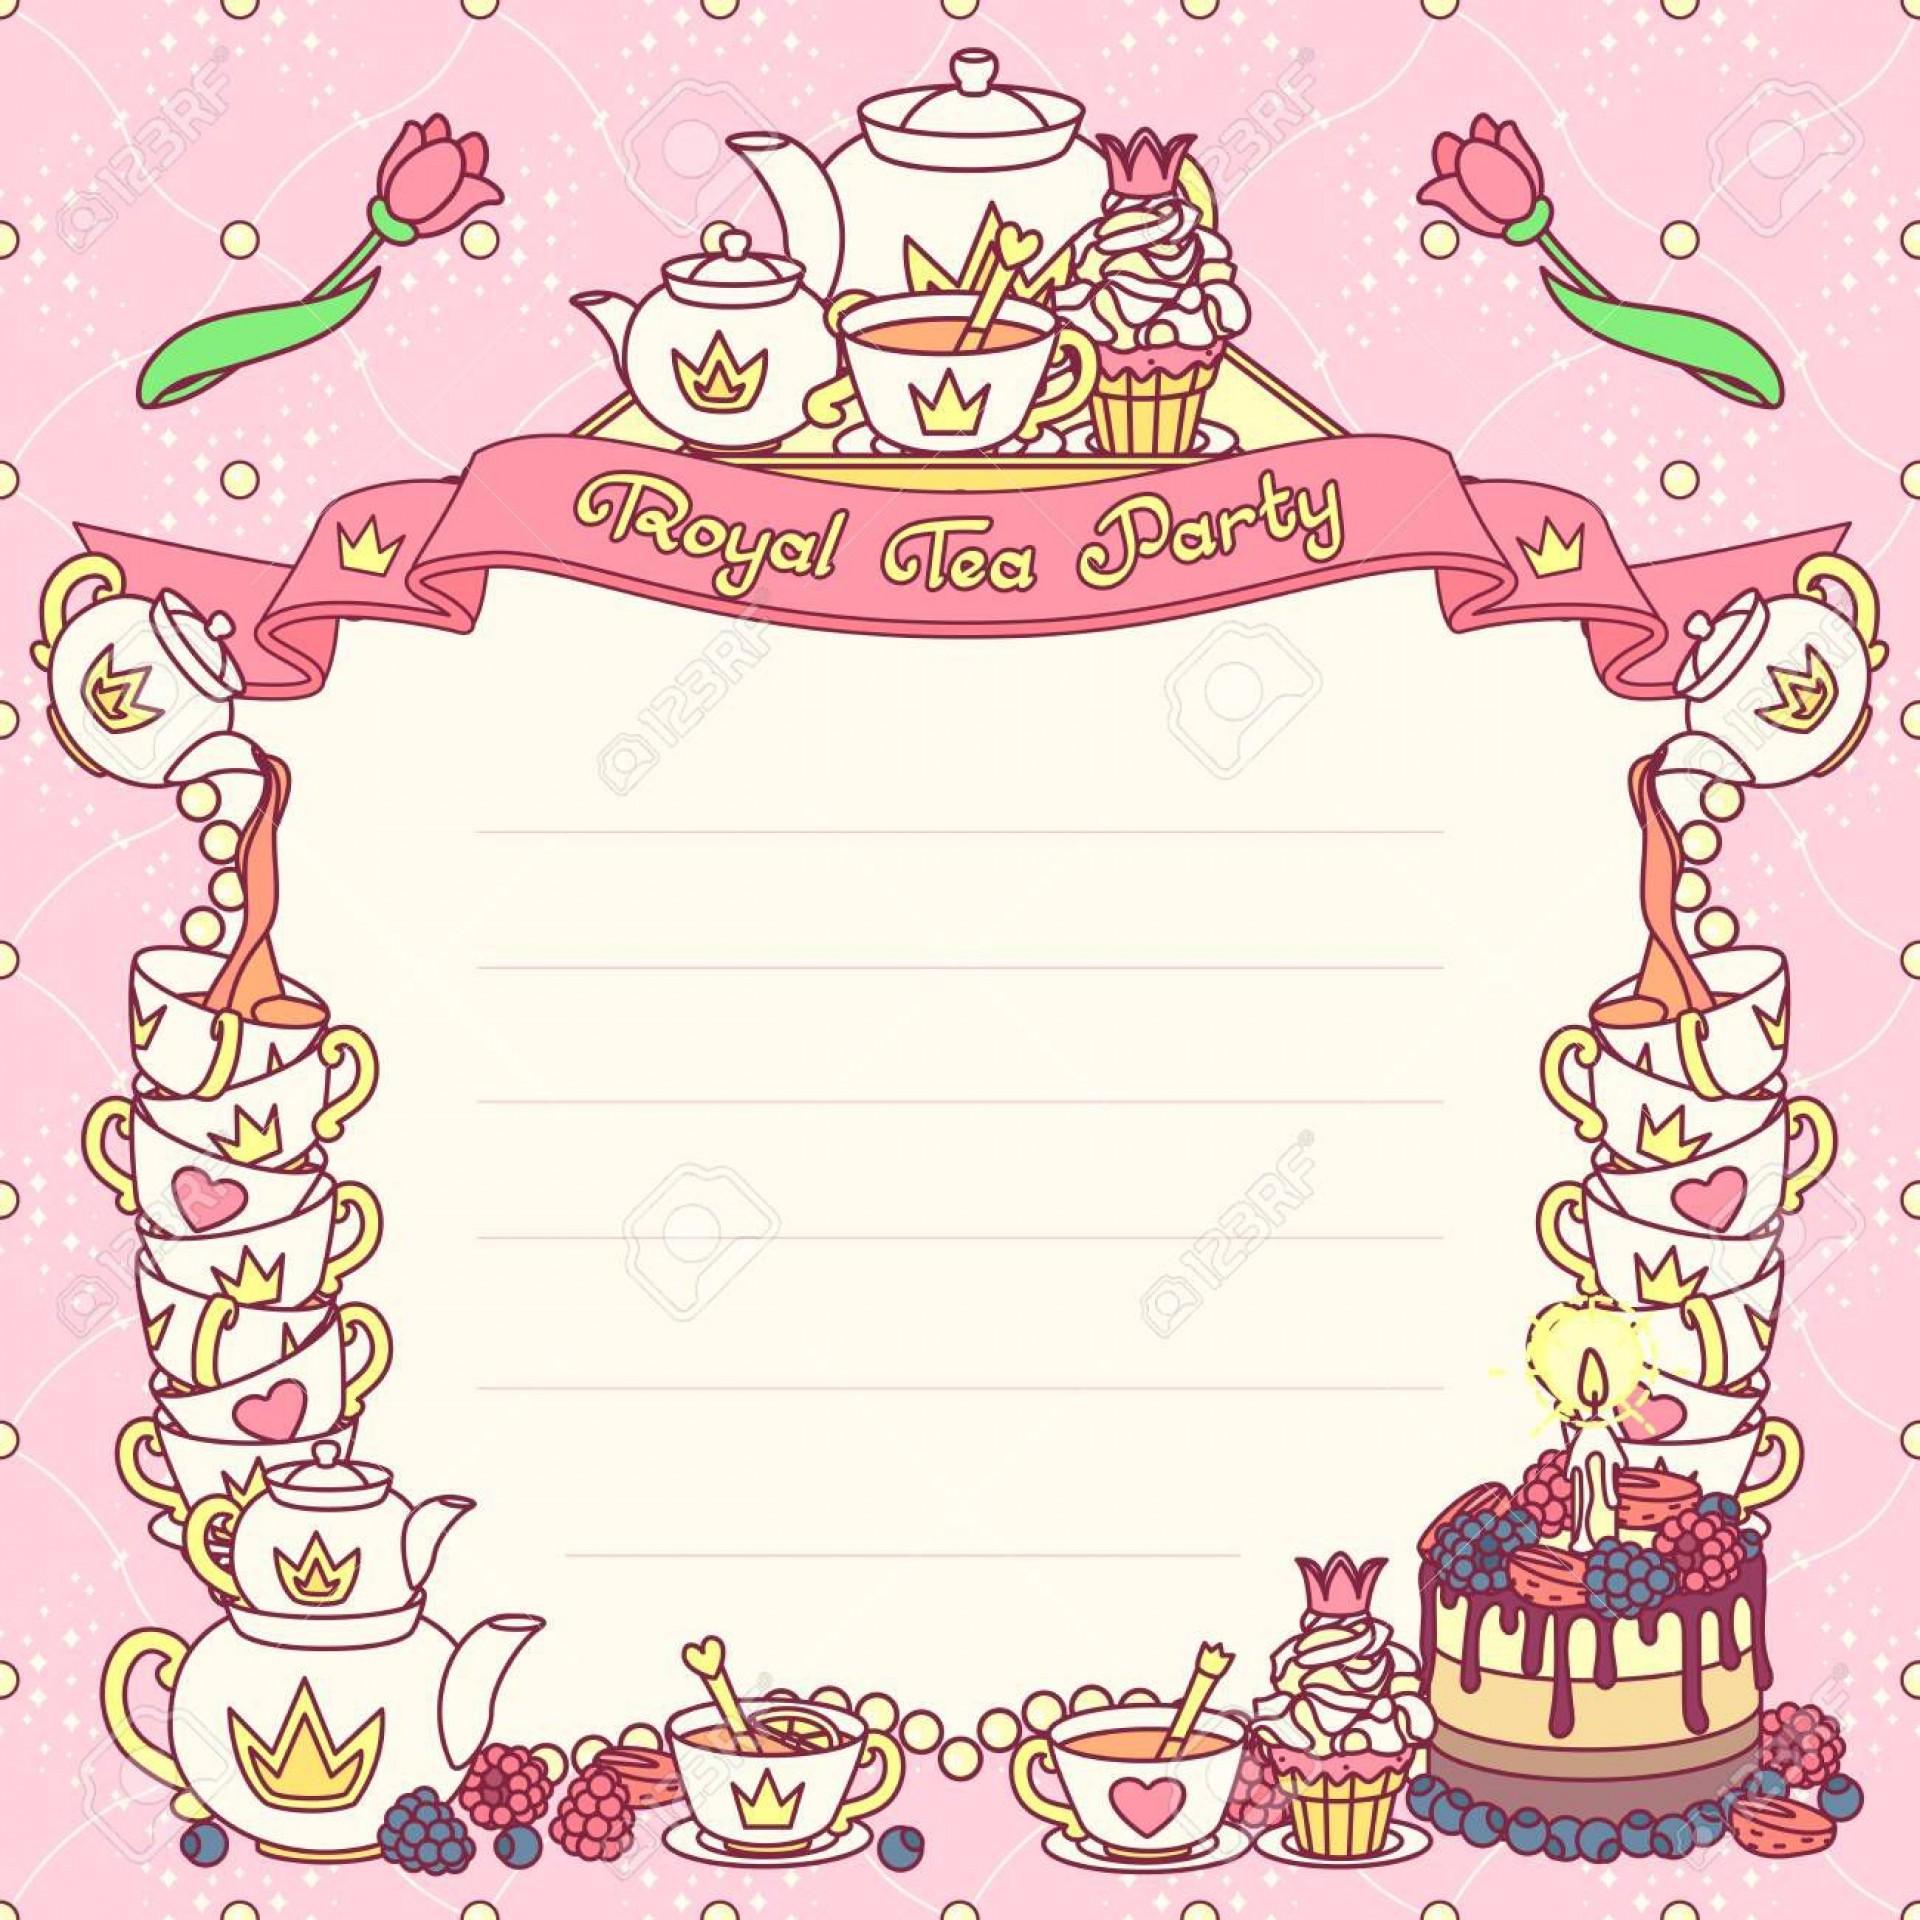 005 Unique Tea Party Invitation Template Image  Templates High Free Download Bridal Shower1920